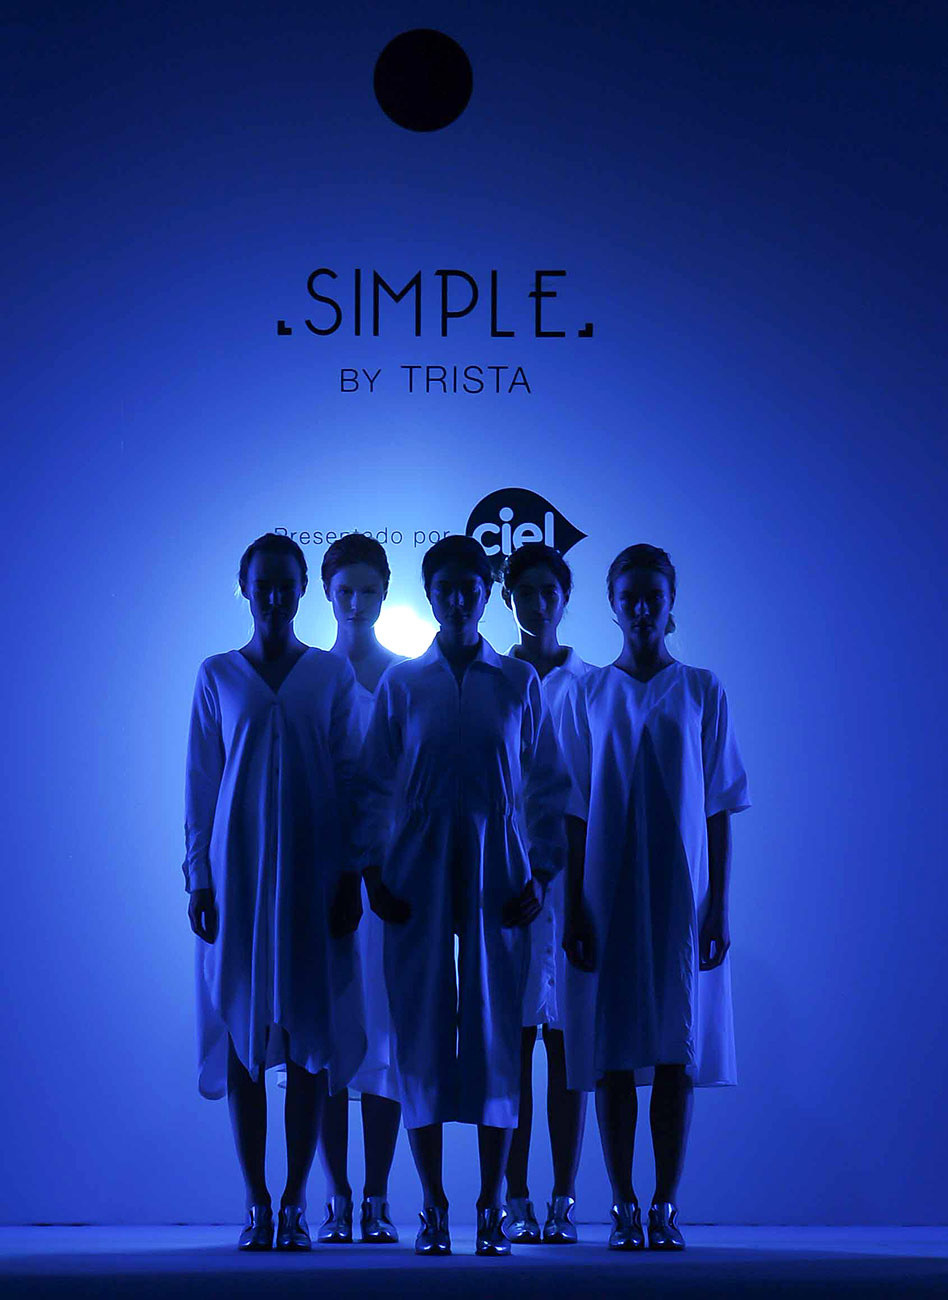 simple_by_trista_pasarela_242322616_948x1300.jpg